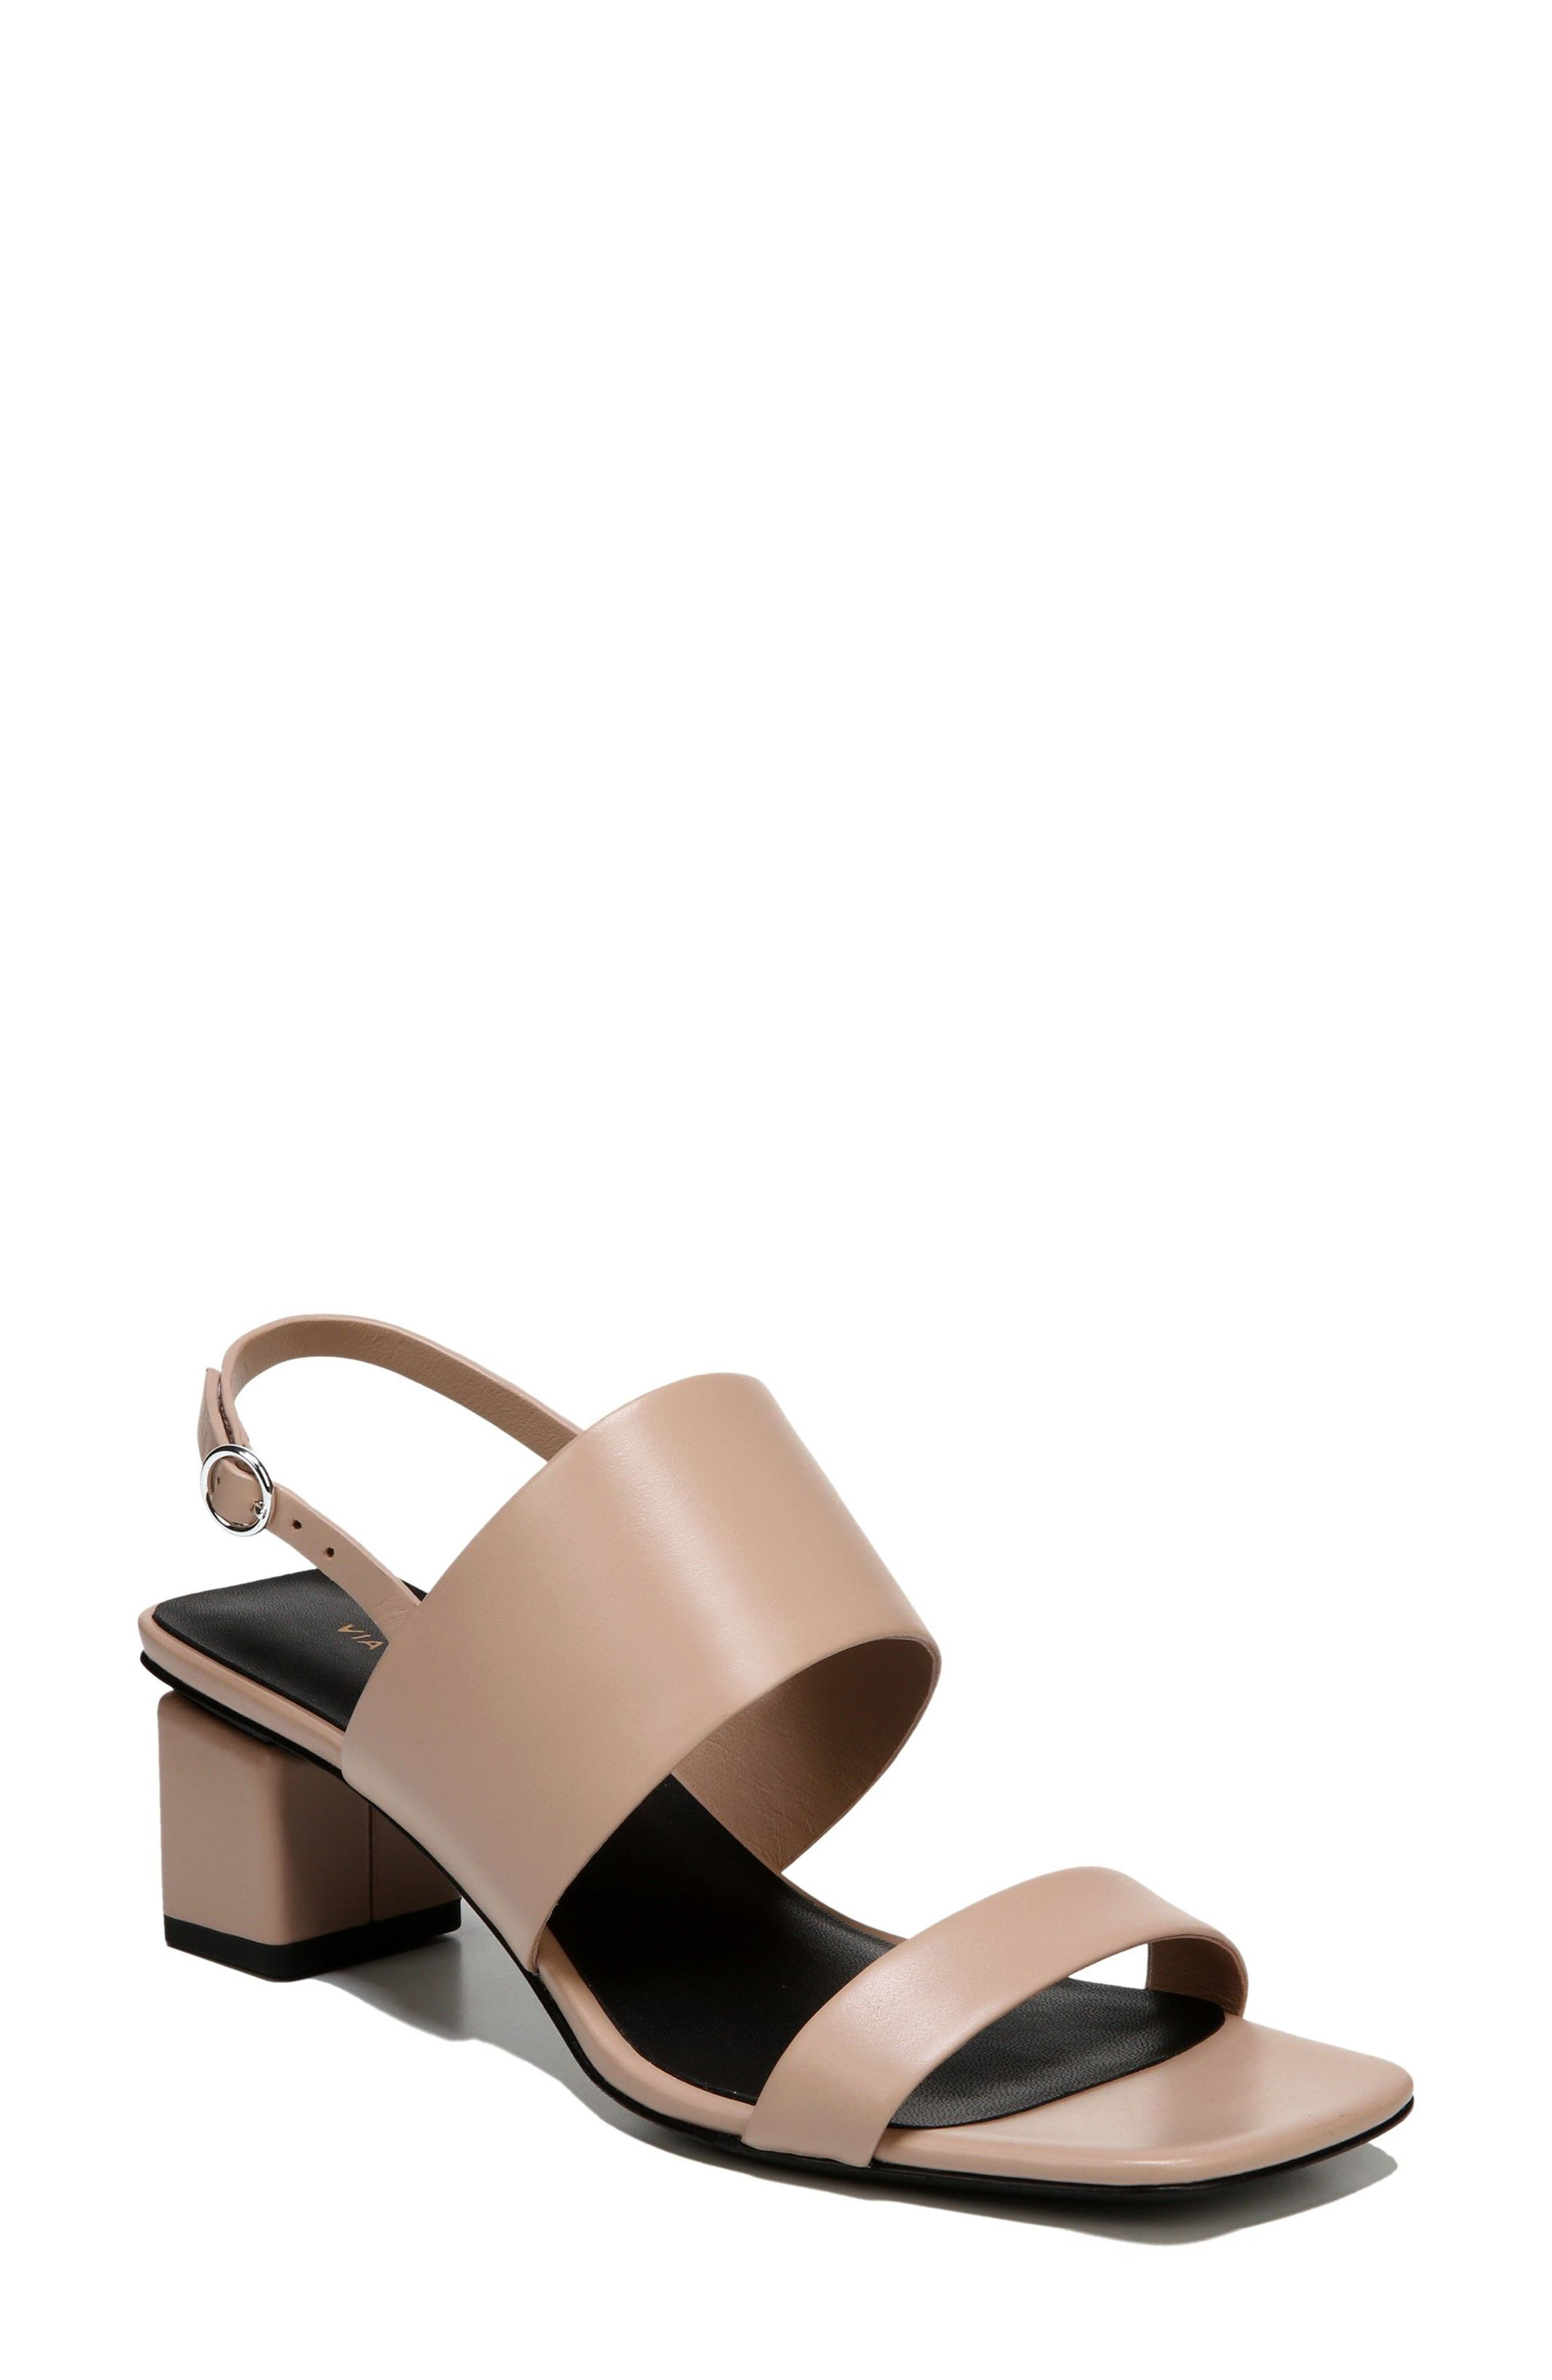 Forte Block Heel Sandal,                         Main,                         color, Sand Patent